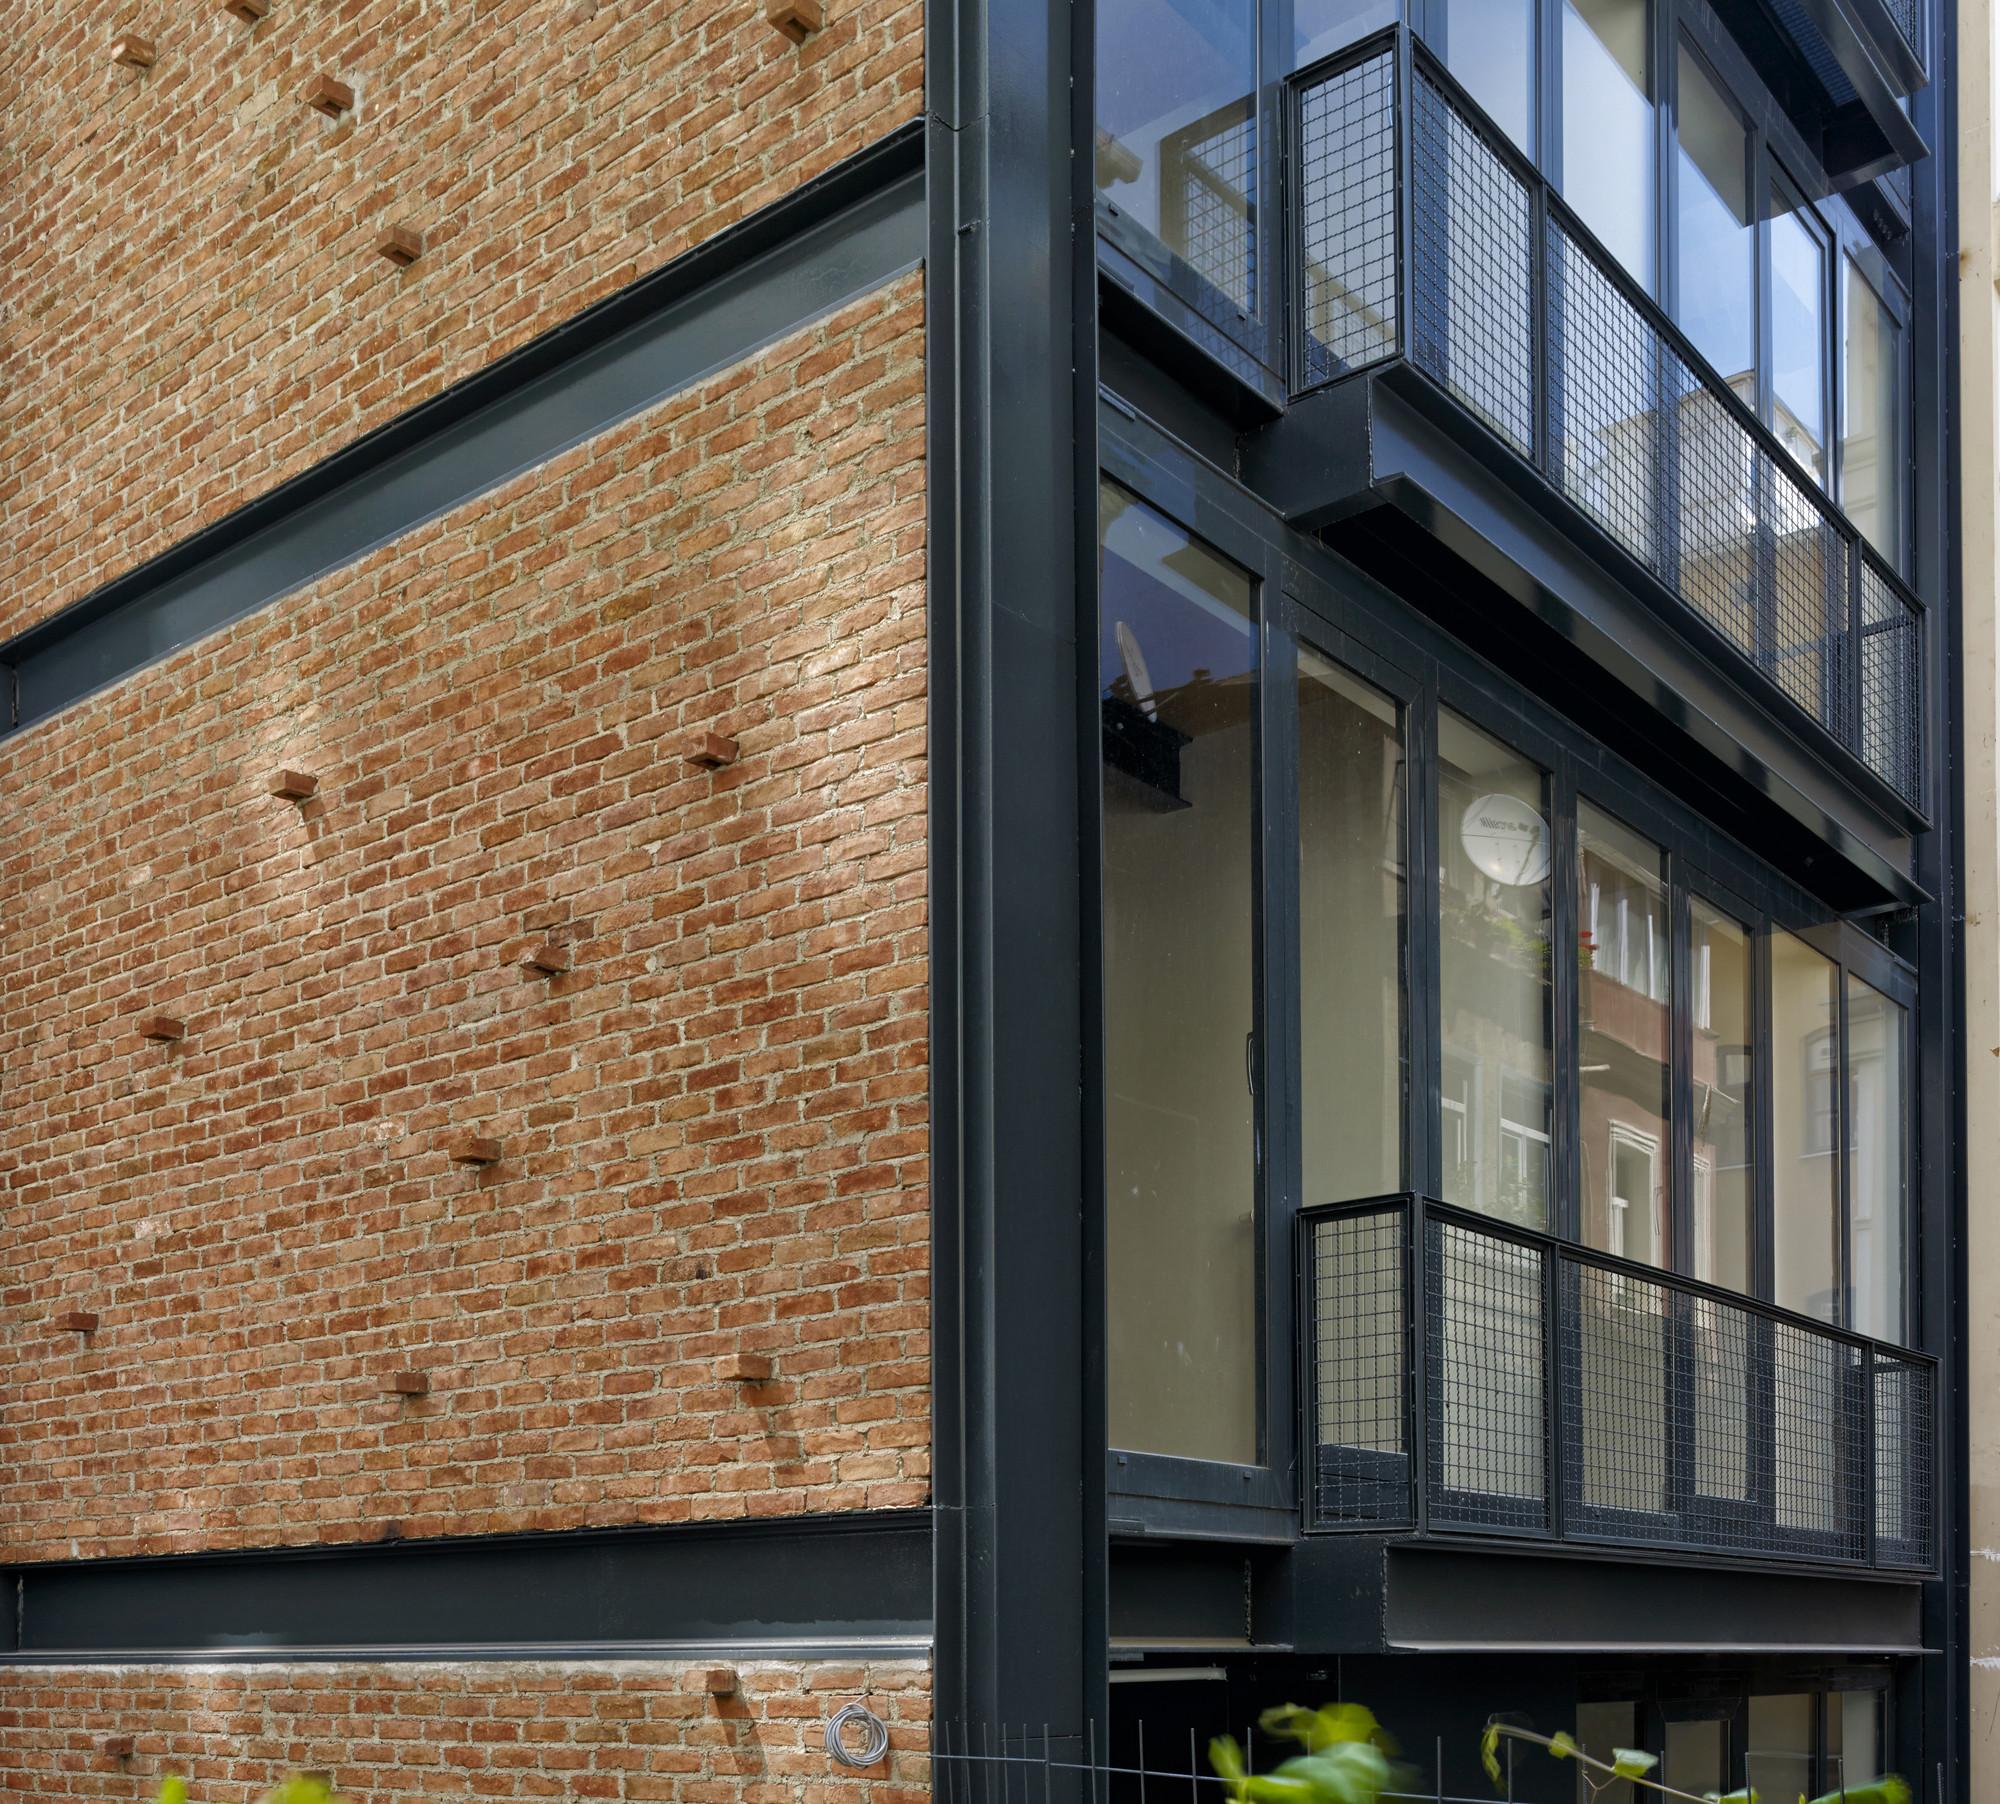 Noxx apartment cm architecture archdaily for Apartment architecture